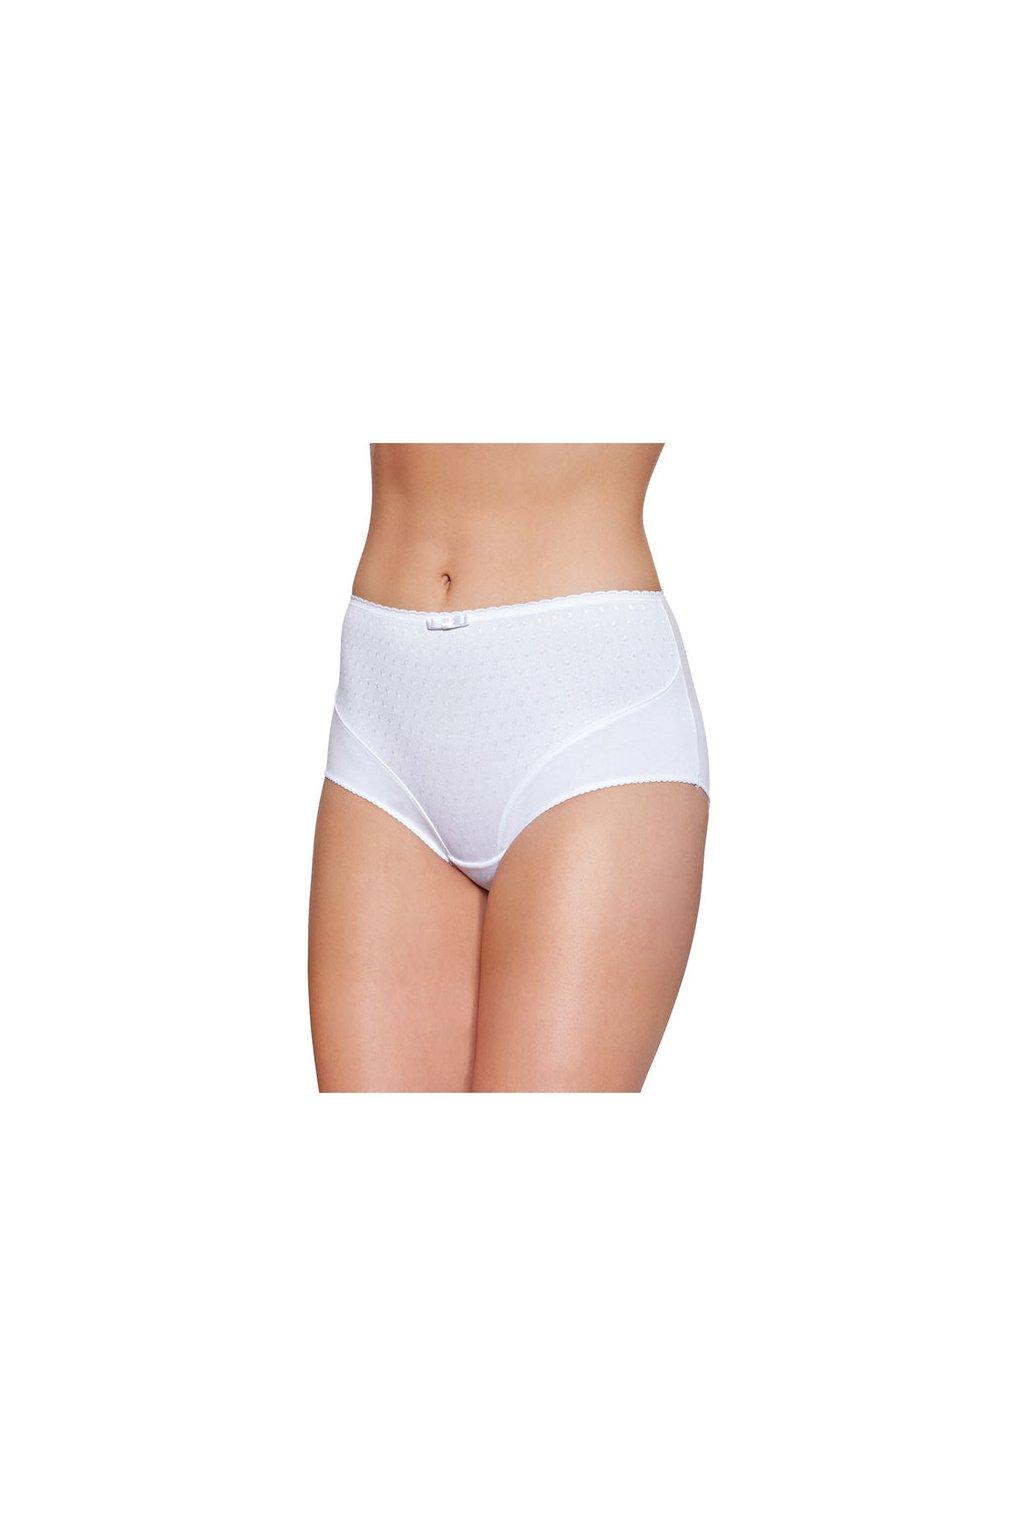 Dámské kalhotky, 100117 1, bílá